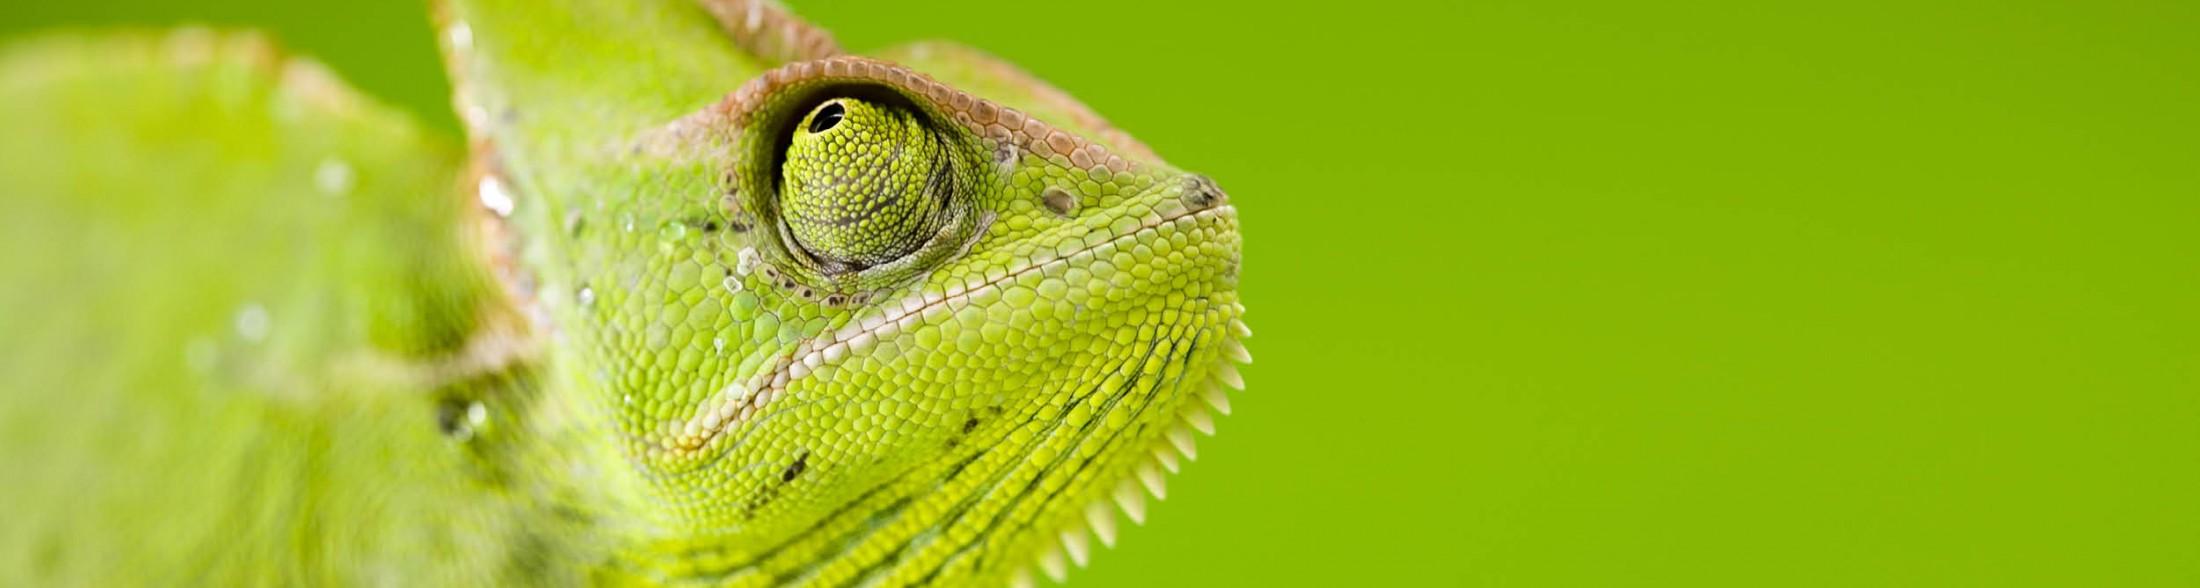 Ingresso verde